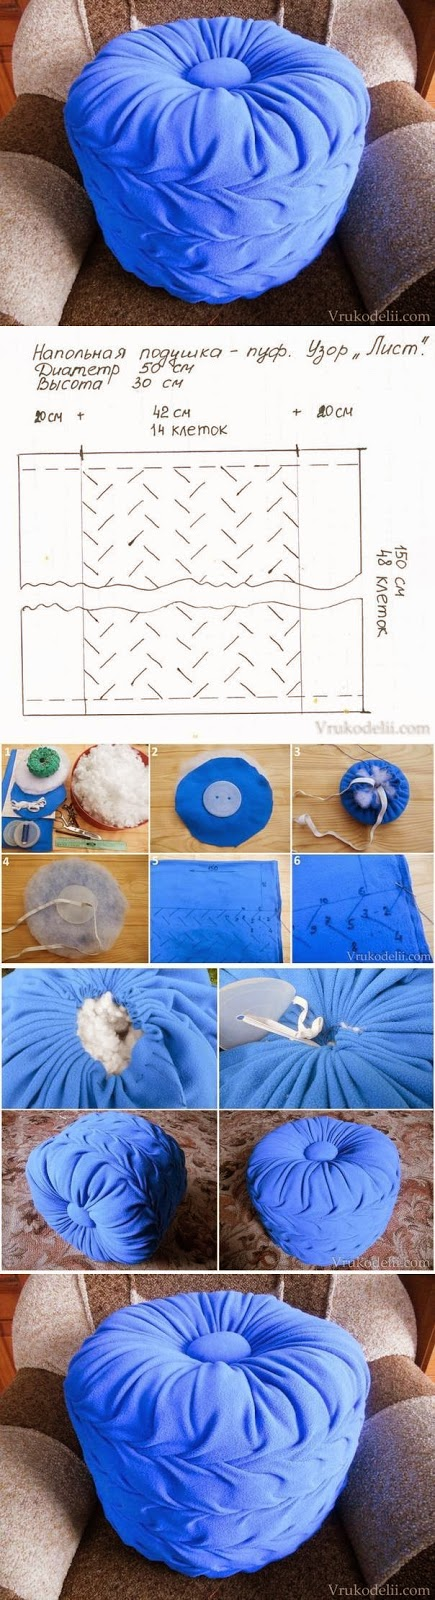 DIY: How To Make Floor Pillow